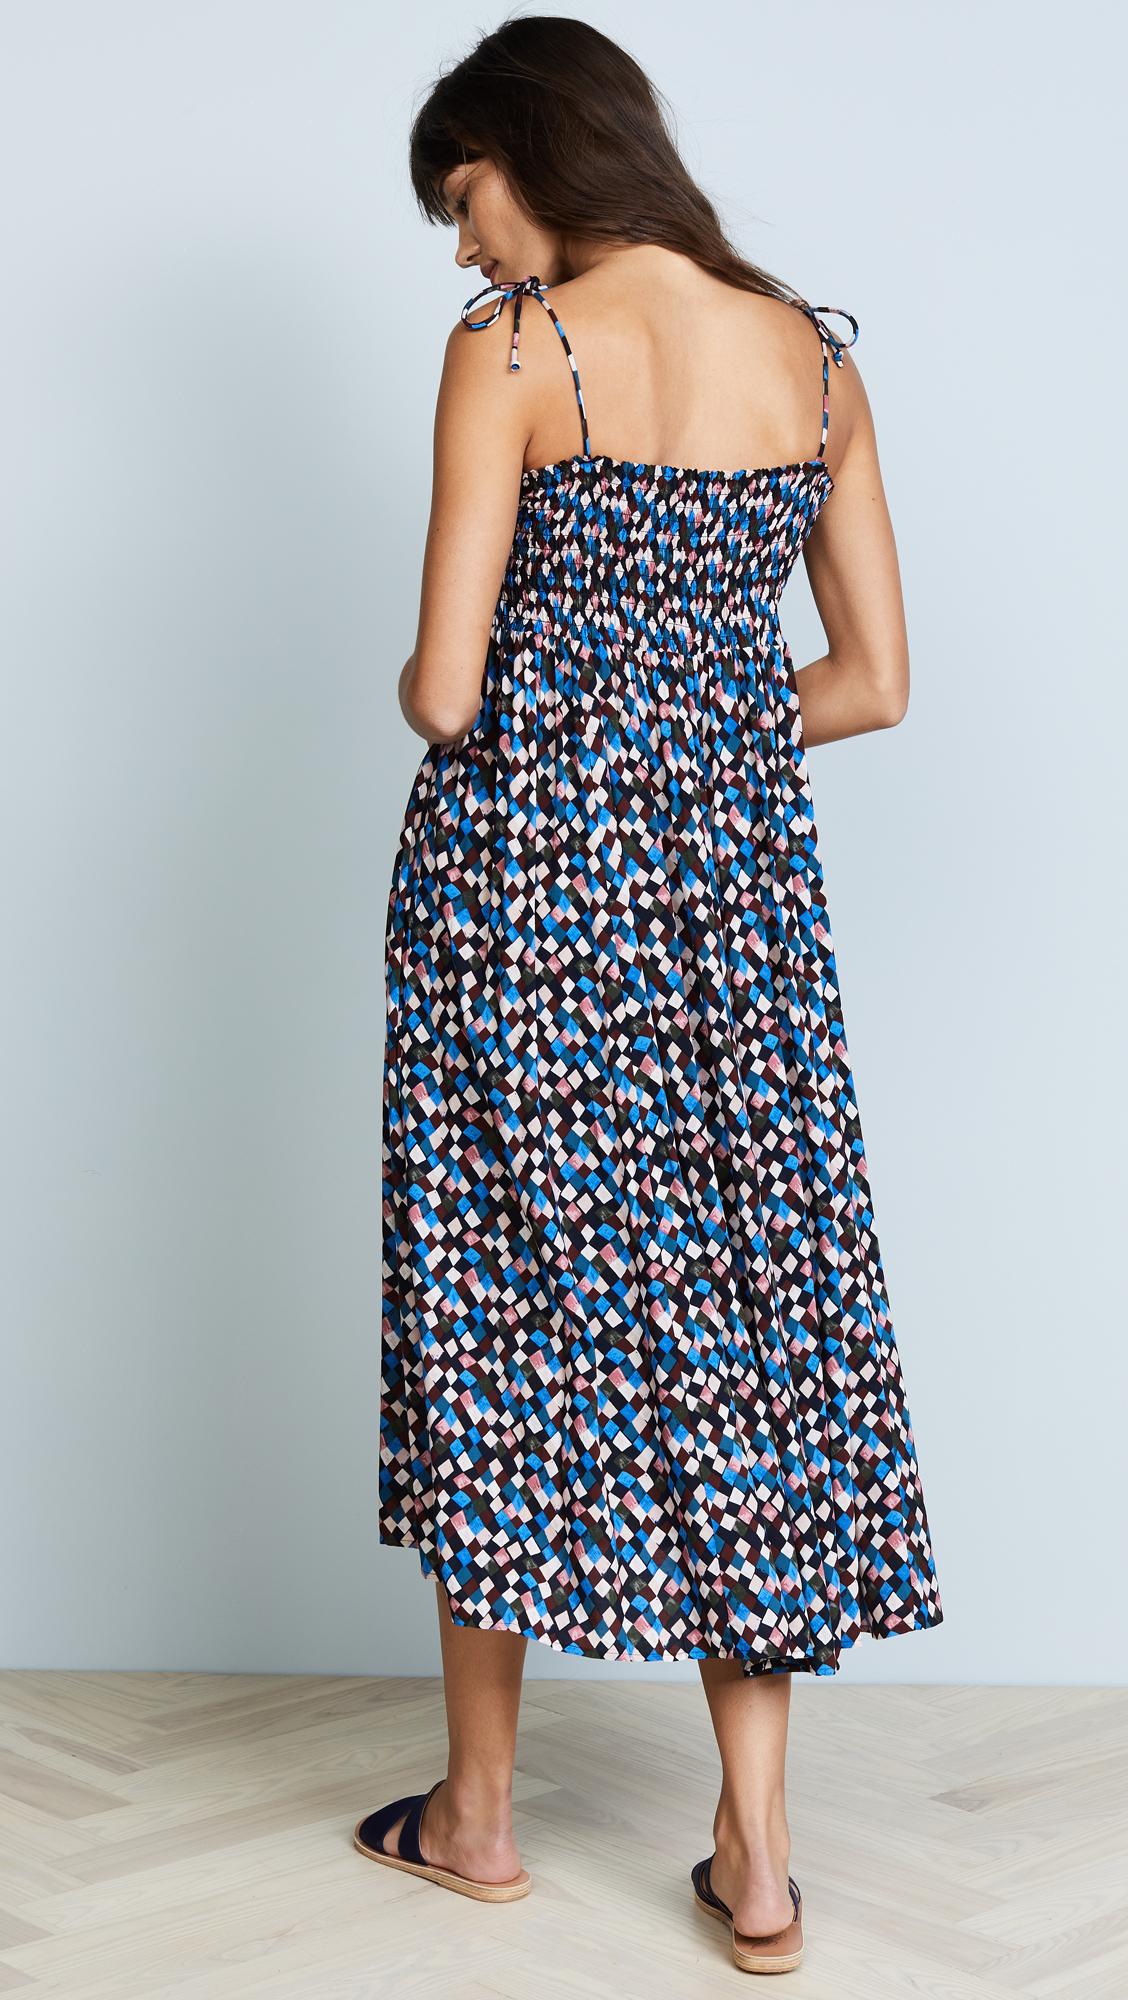 582b2fc280b0d Tory Burch Prism Convertible Beach Dress | SHOPBOP